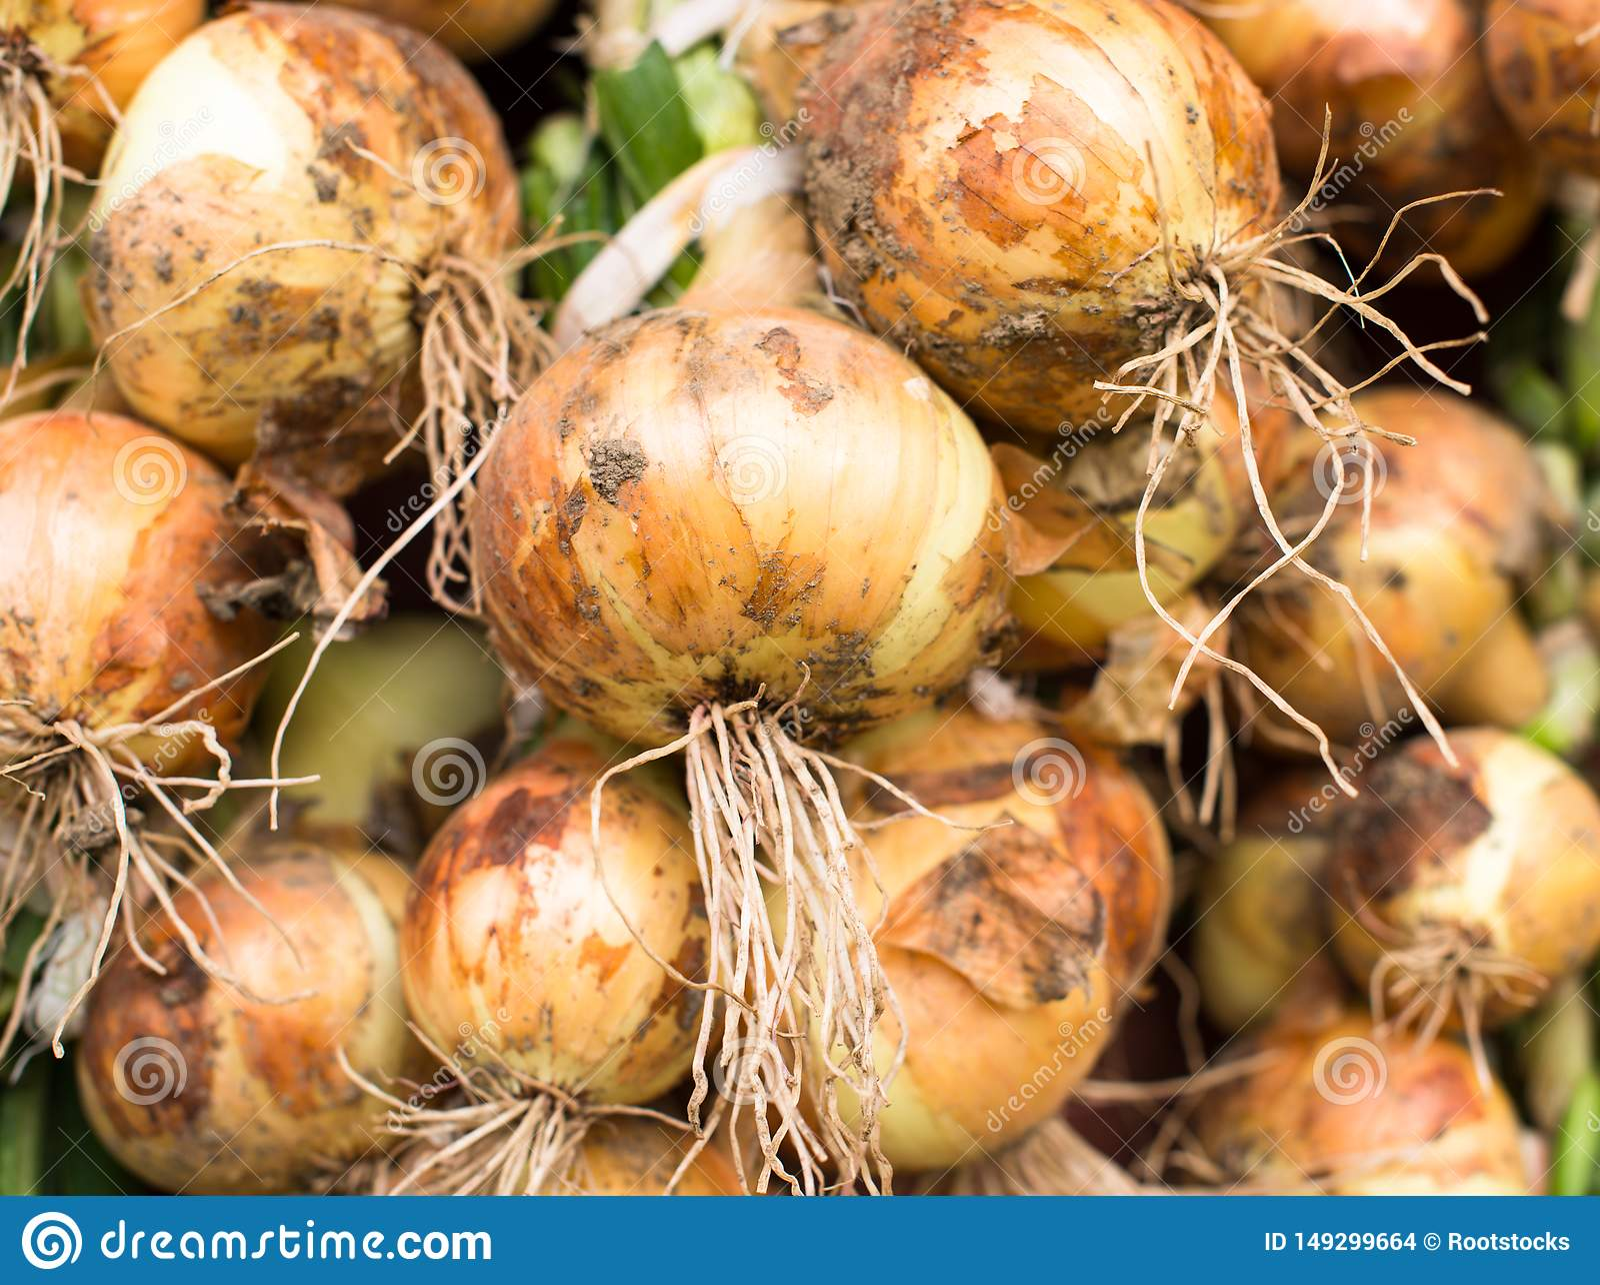 Freshly dug onion bulbs